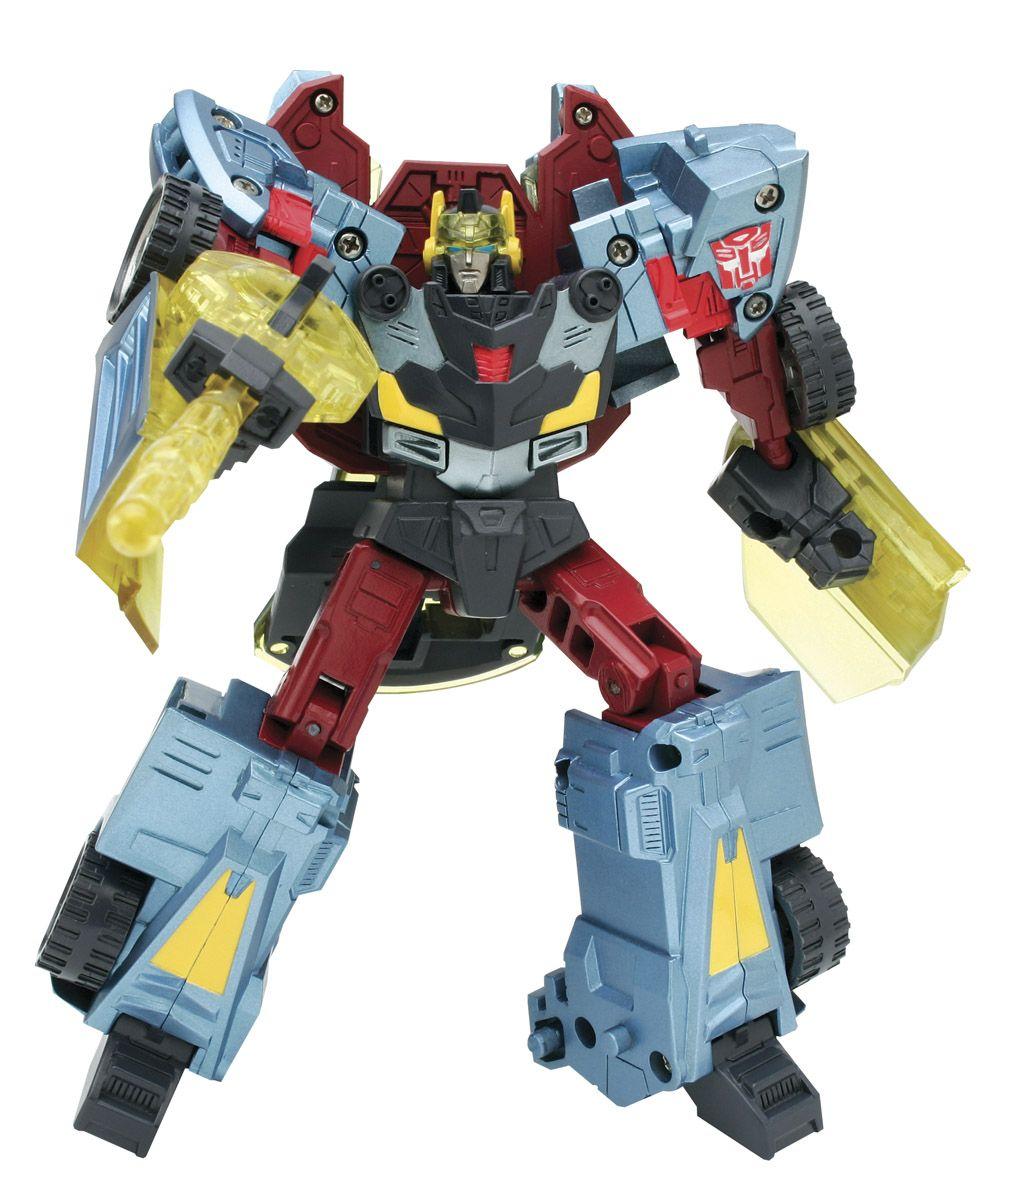 Hotshot Transformers Cybertron Transformers Cybertron Hot Shots Transformers Toys